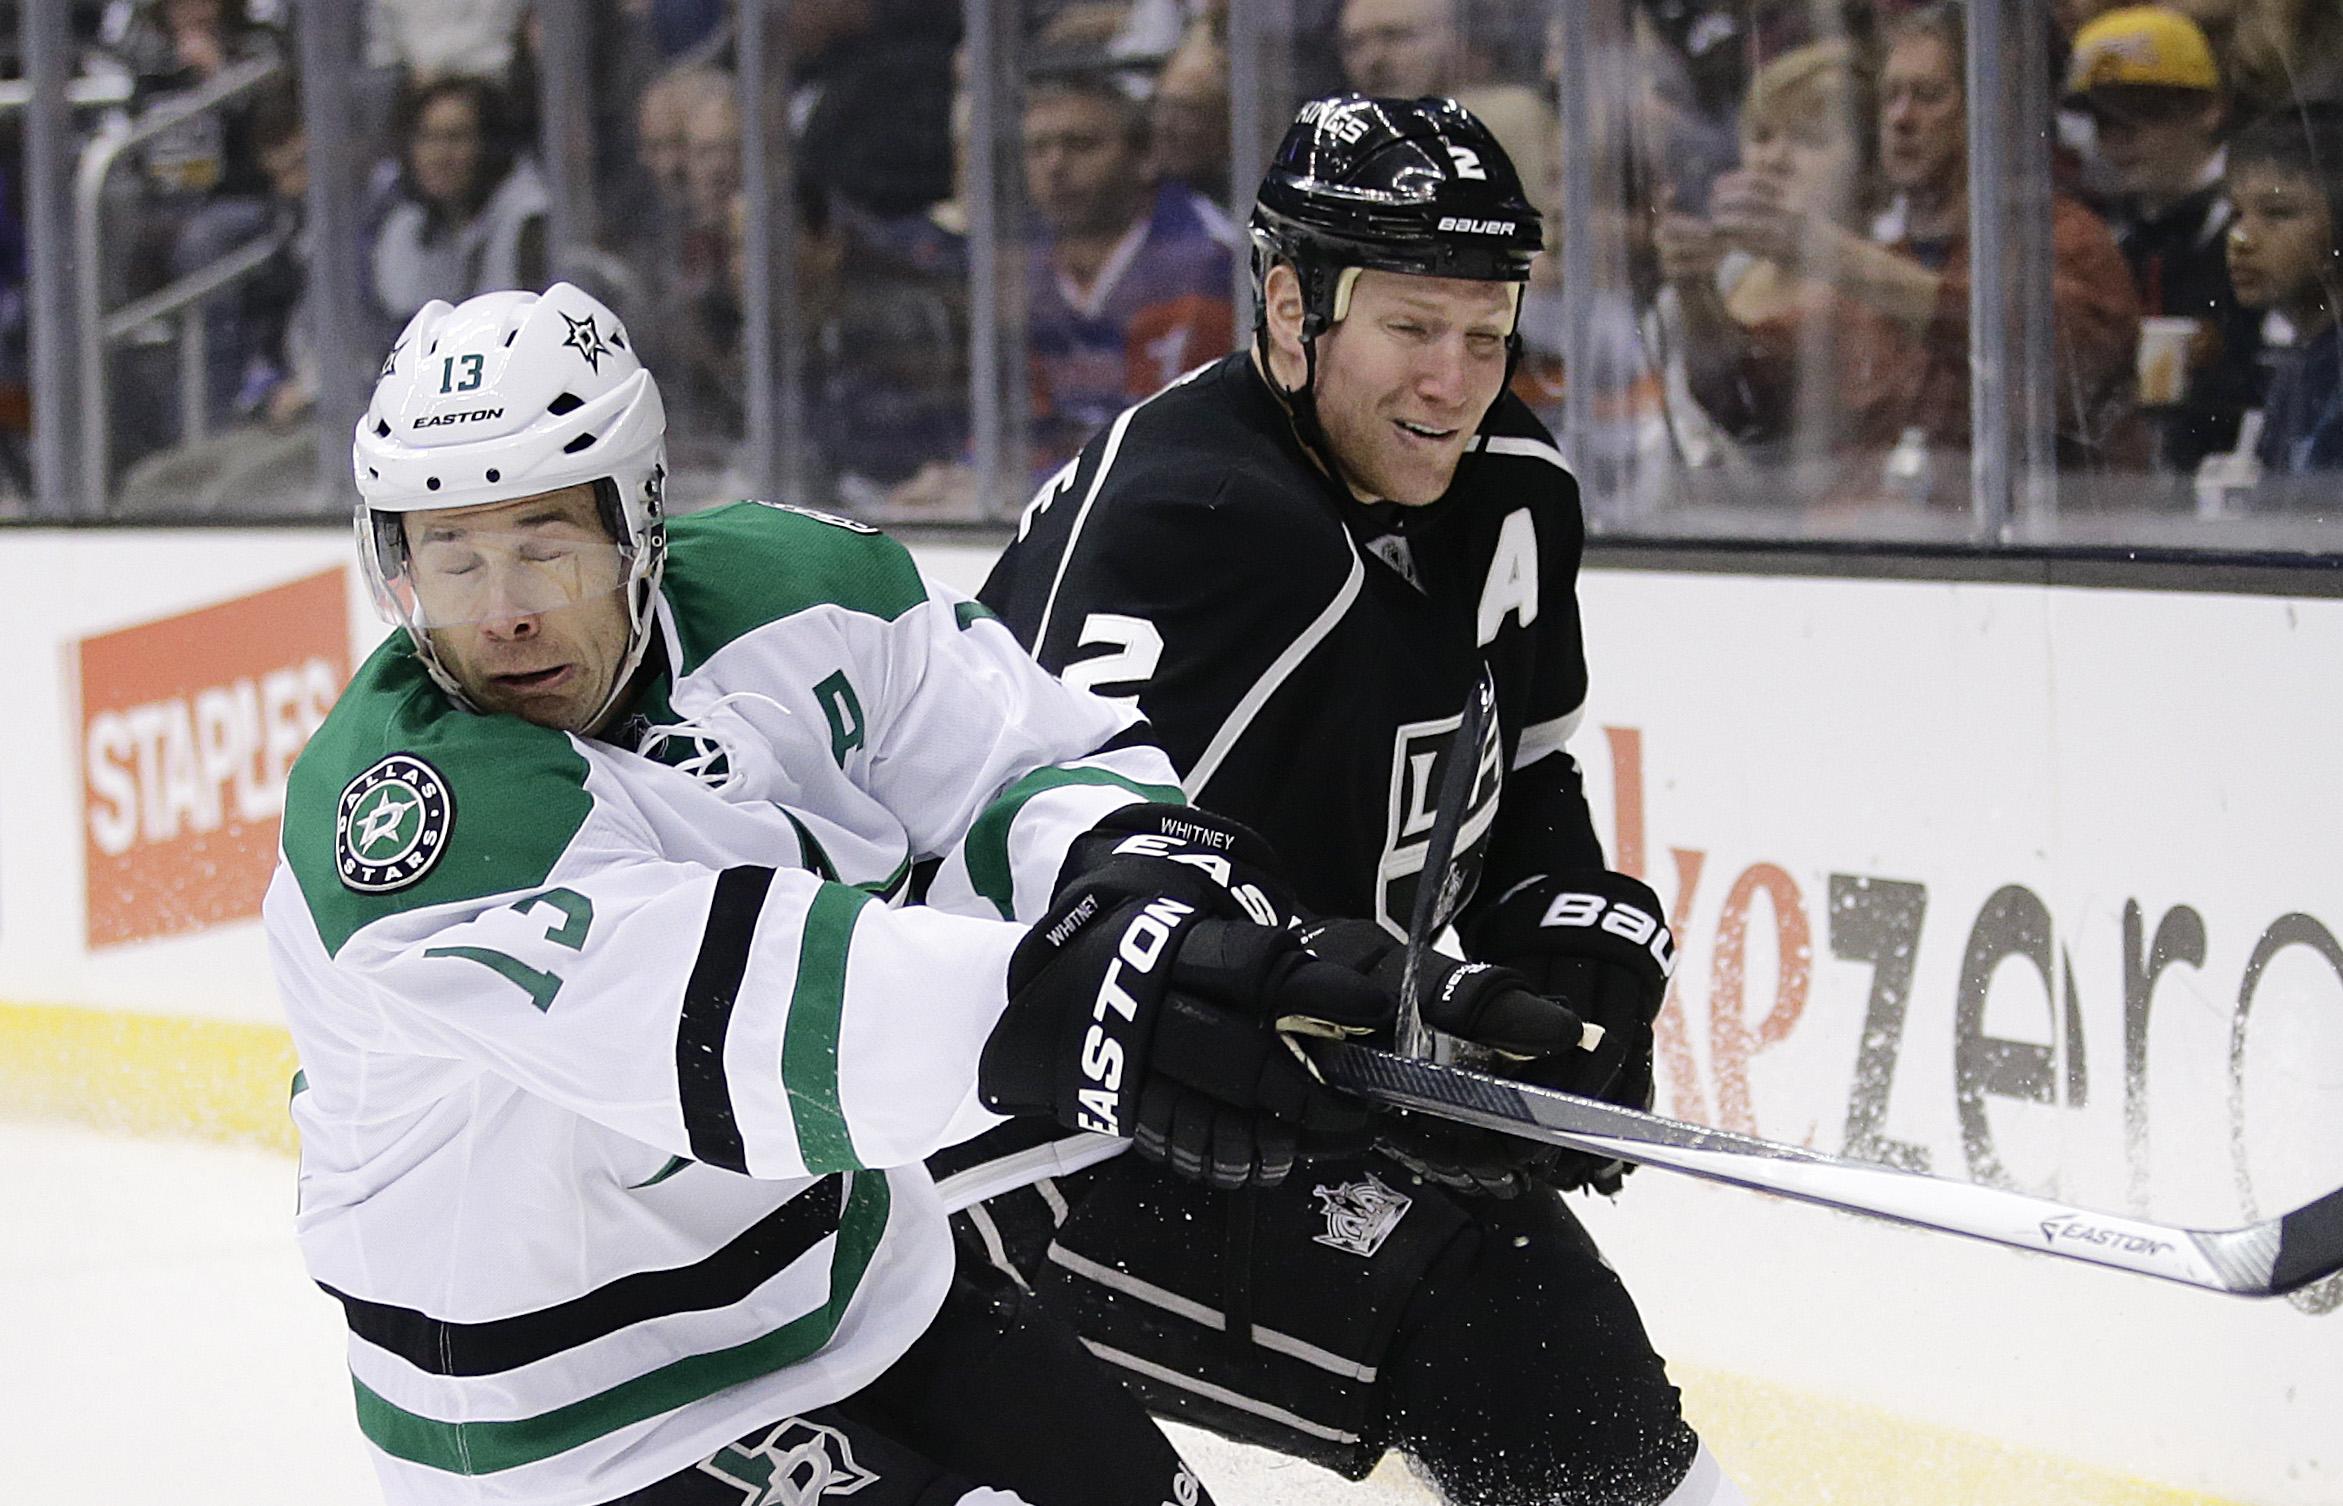 Stars hand Kings' Jones 1st NHL loss after 8 wins